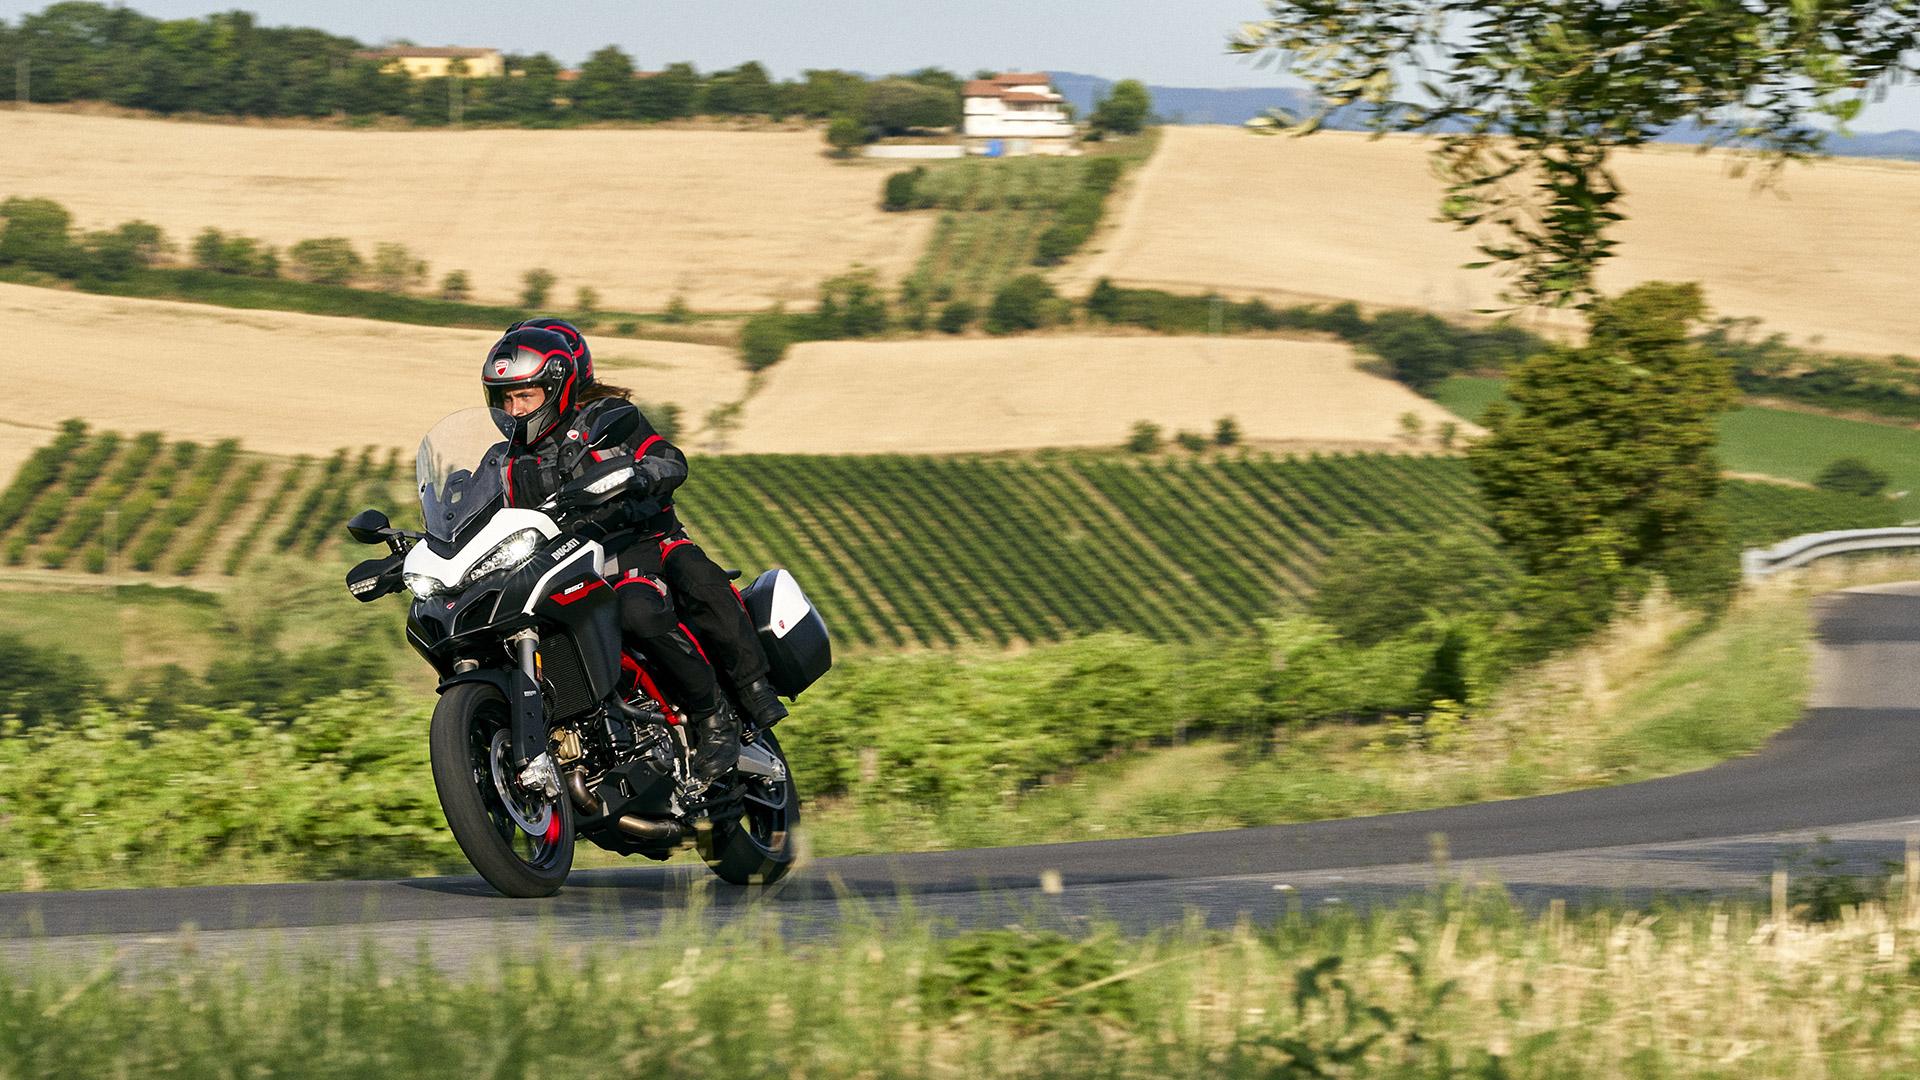 Ducati MTS-950-S- India MotorZest 2